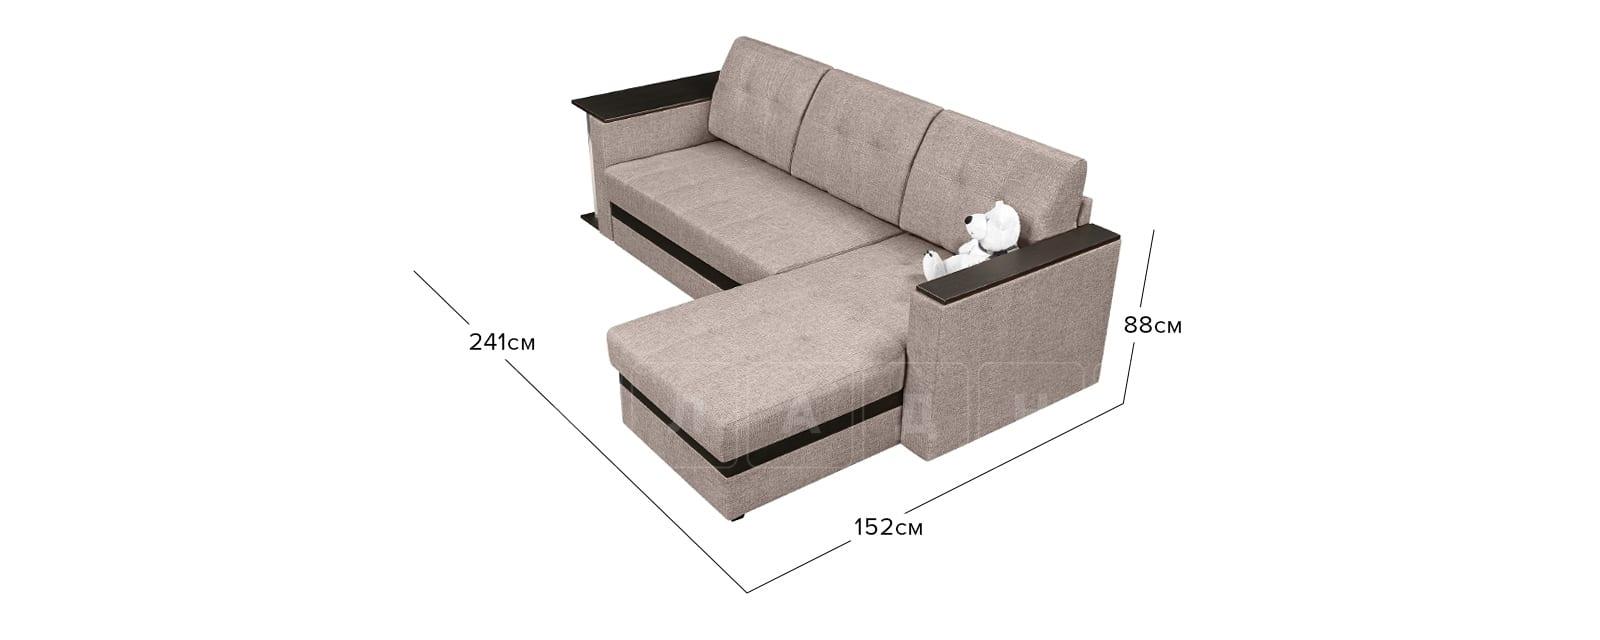 Угловой диван Атланта рогожка темно-бежевого цвета фото 9 | интернет-магазин Складно